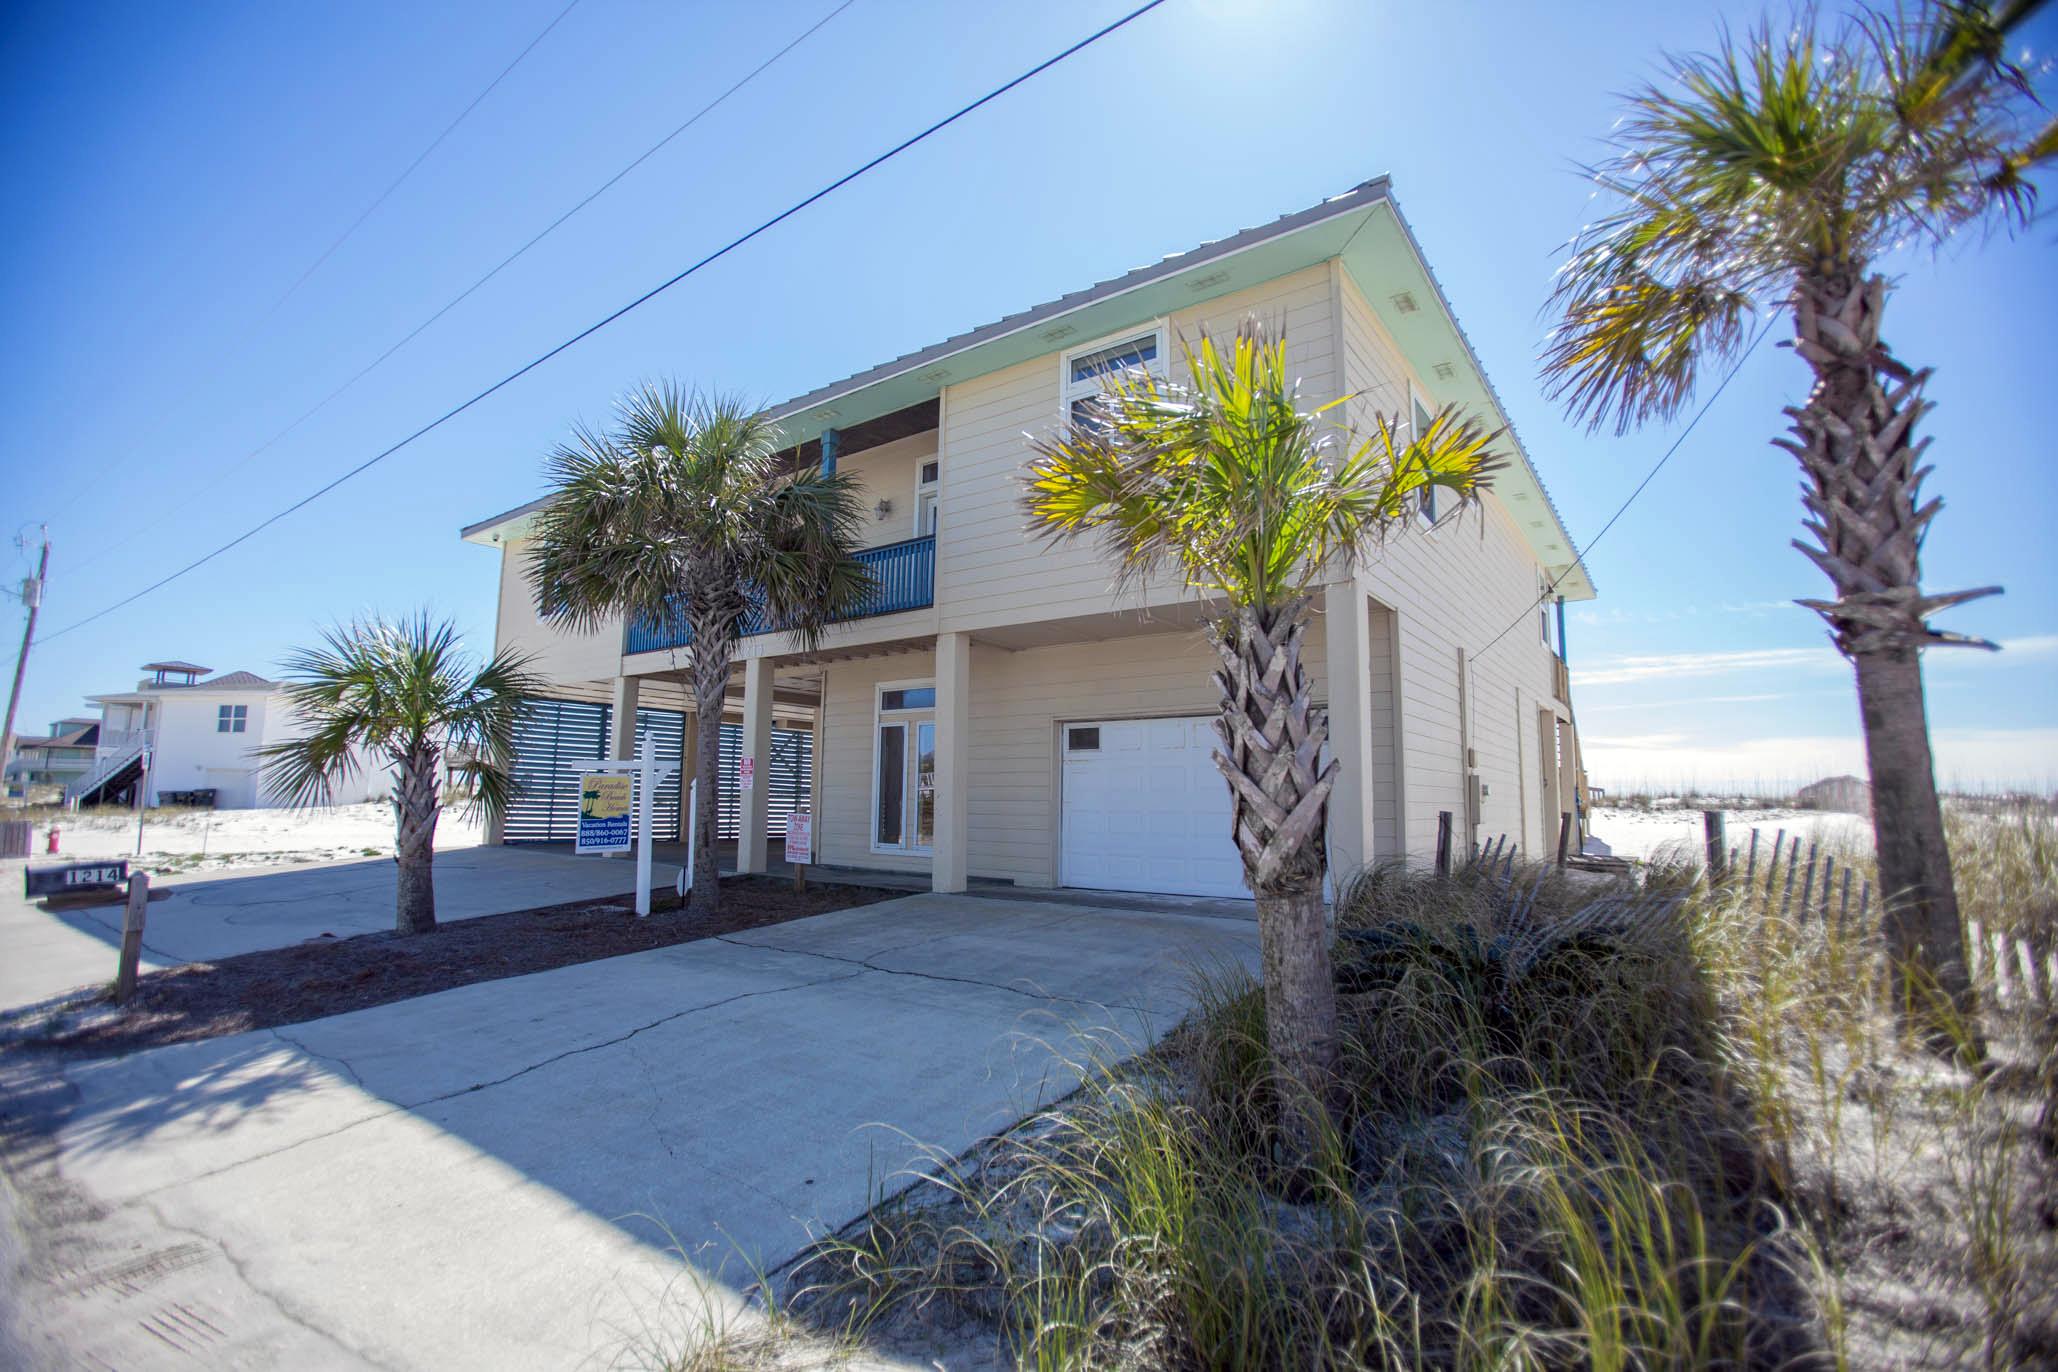 Ariola 1214 House/Cottage rental in Luxury Homes in Pensacola Beach Florida - #4